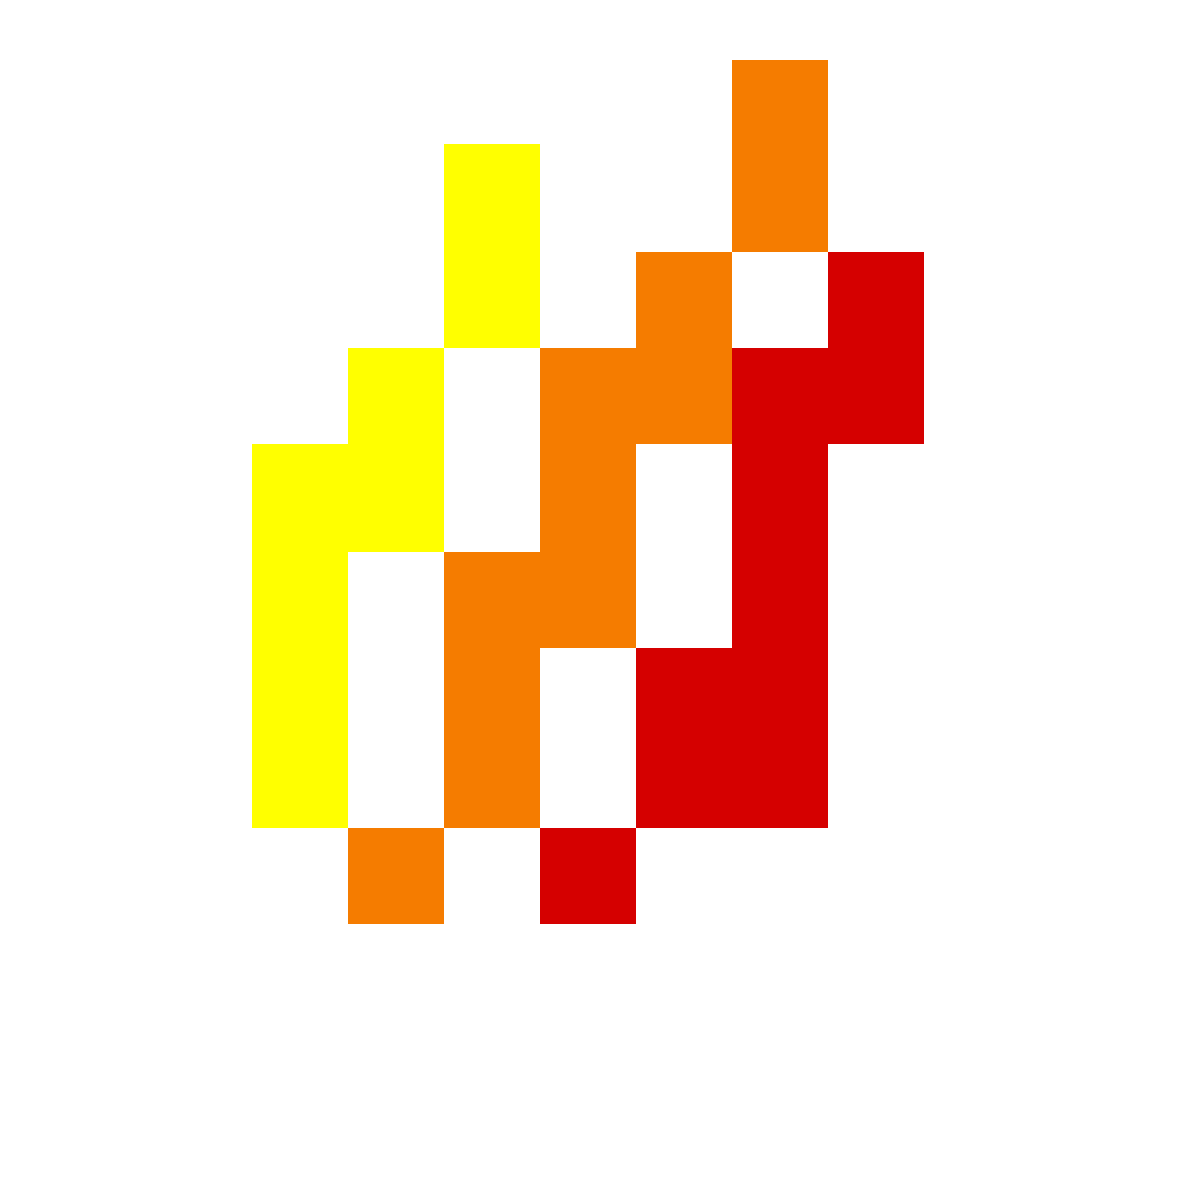 Pixilart - Preston Playz Flame logo by BeatBoy